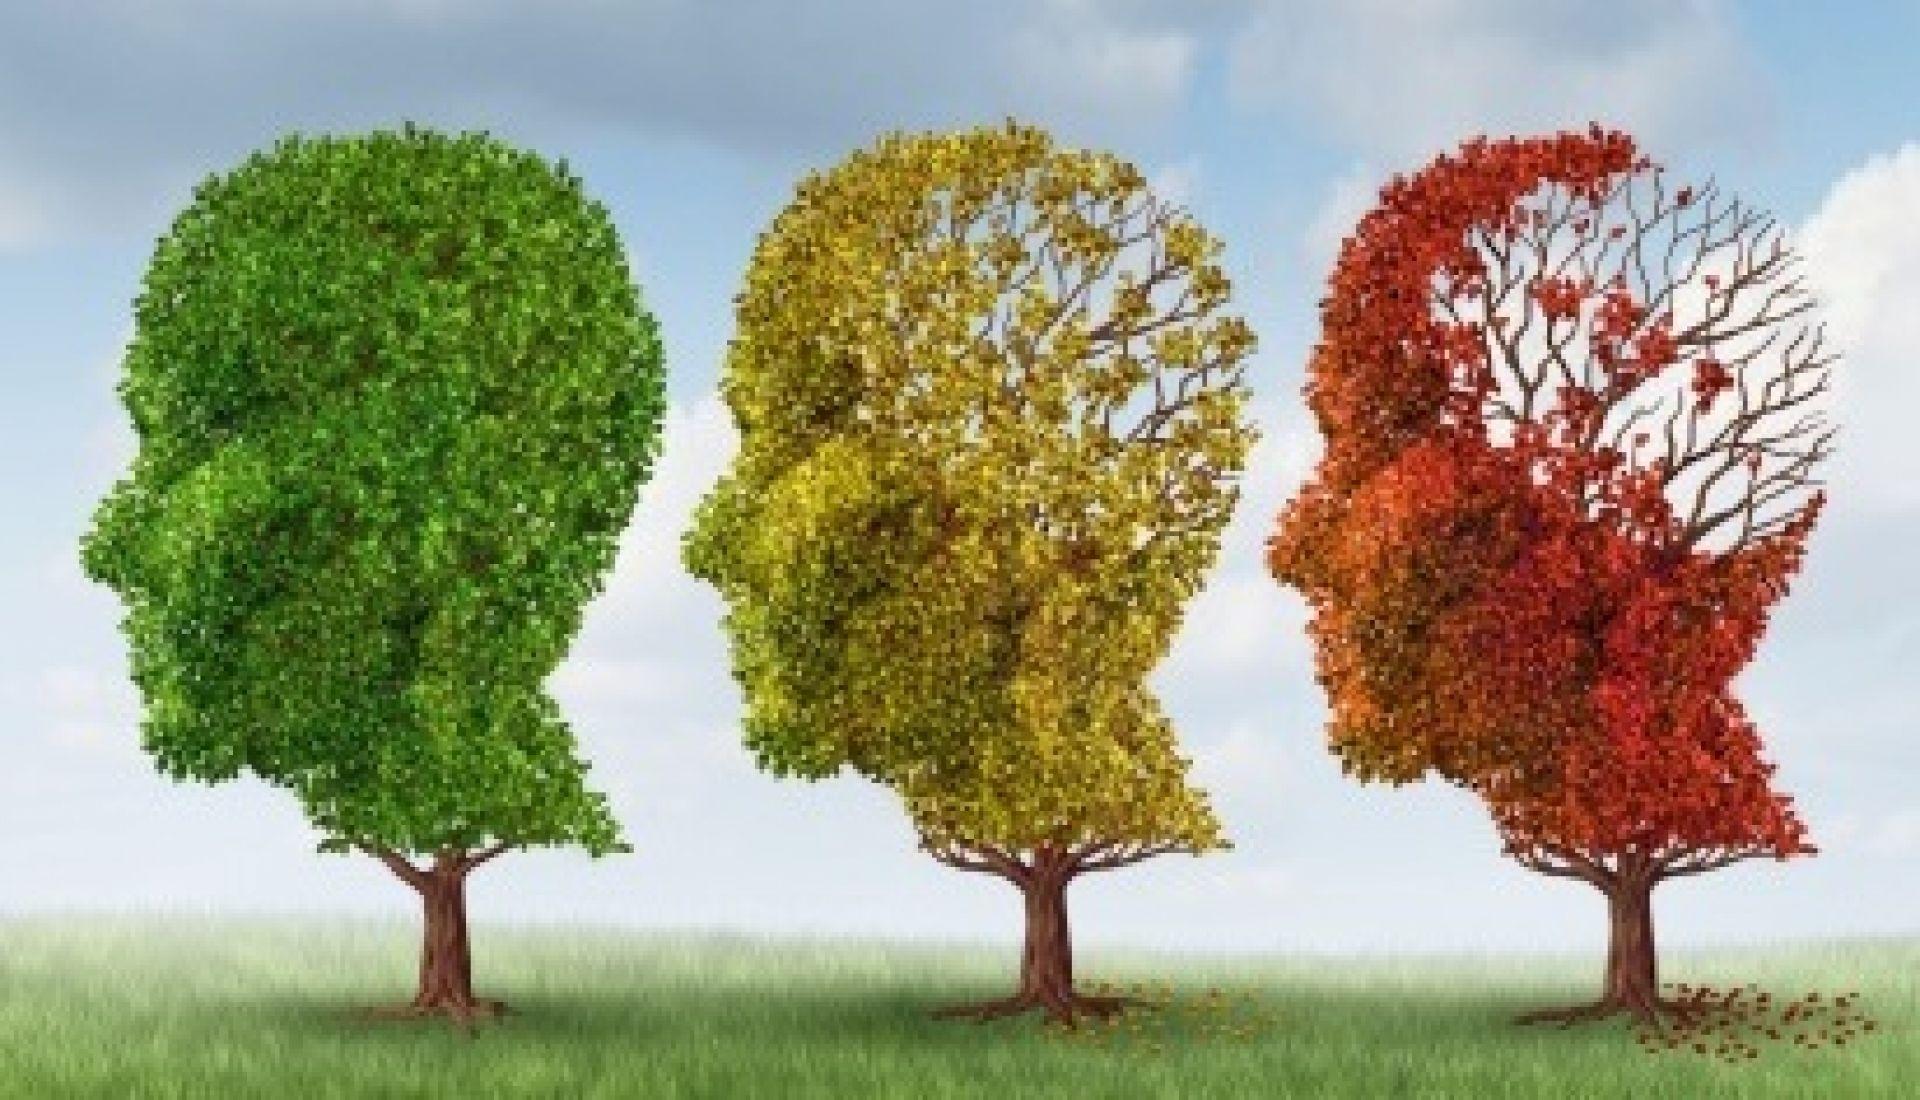 dementia-image-web_2-crop.jpg